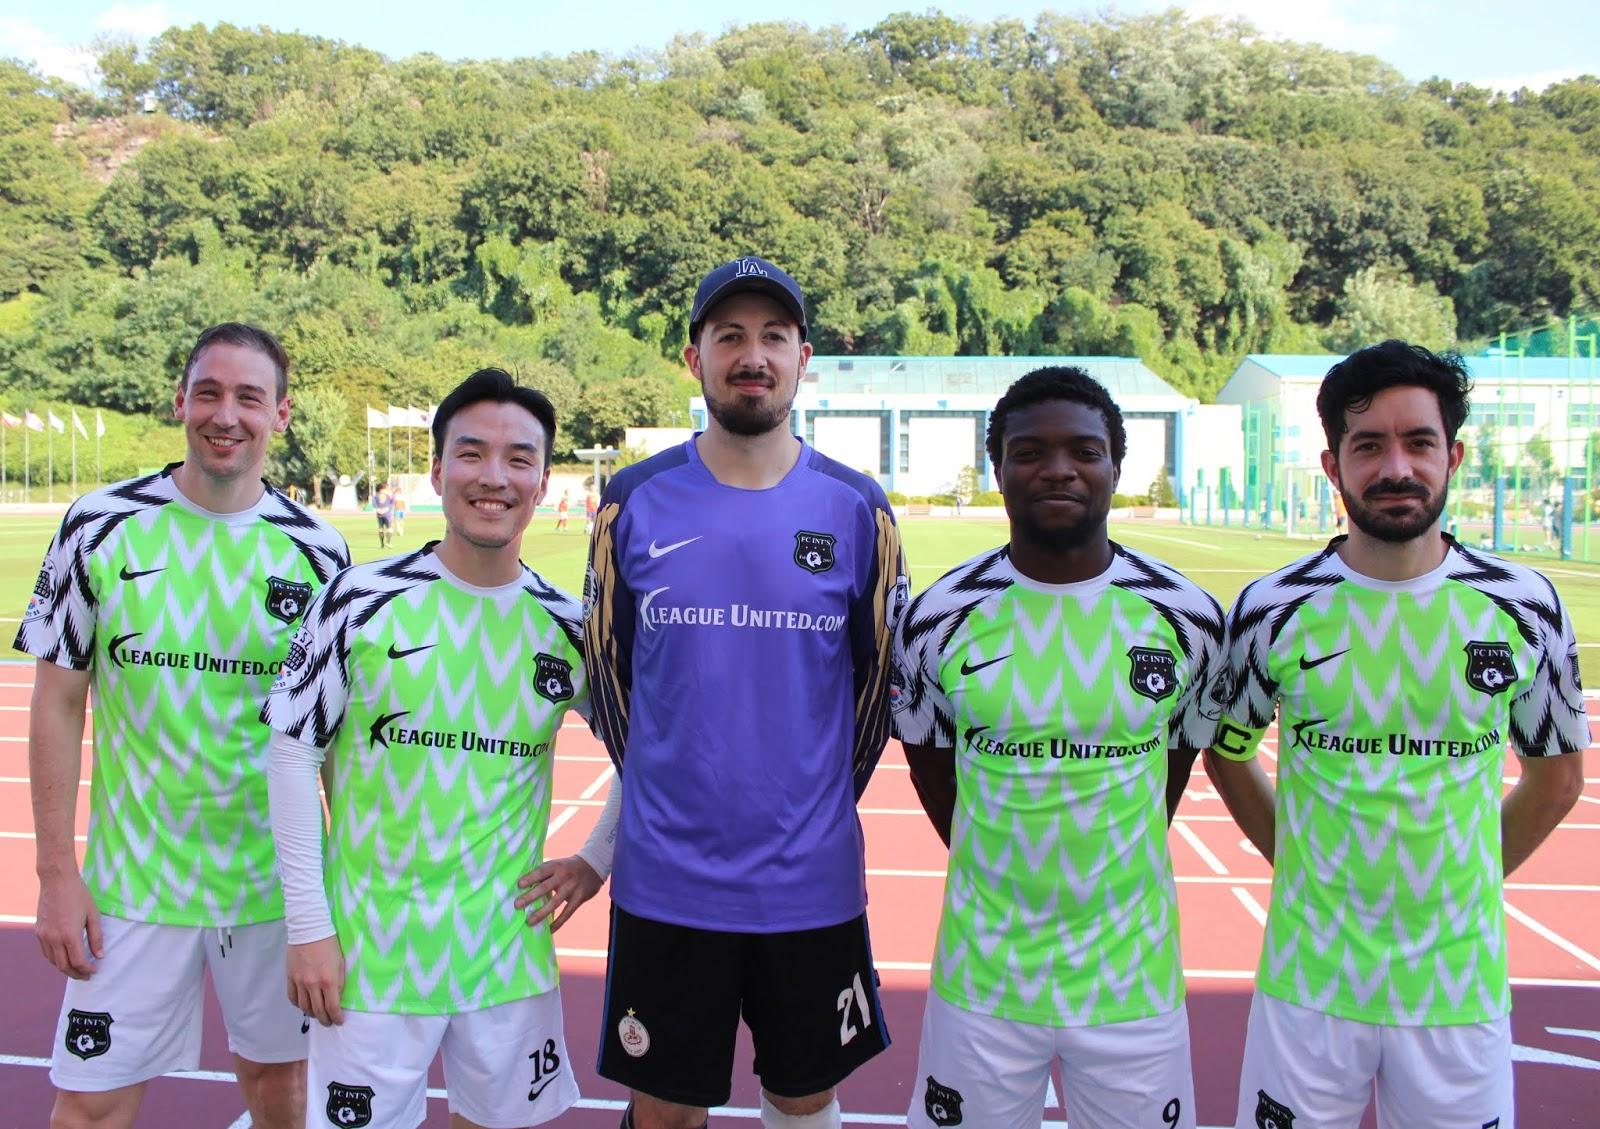 K League United Sponsorship FC INTS